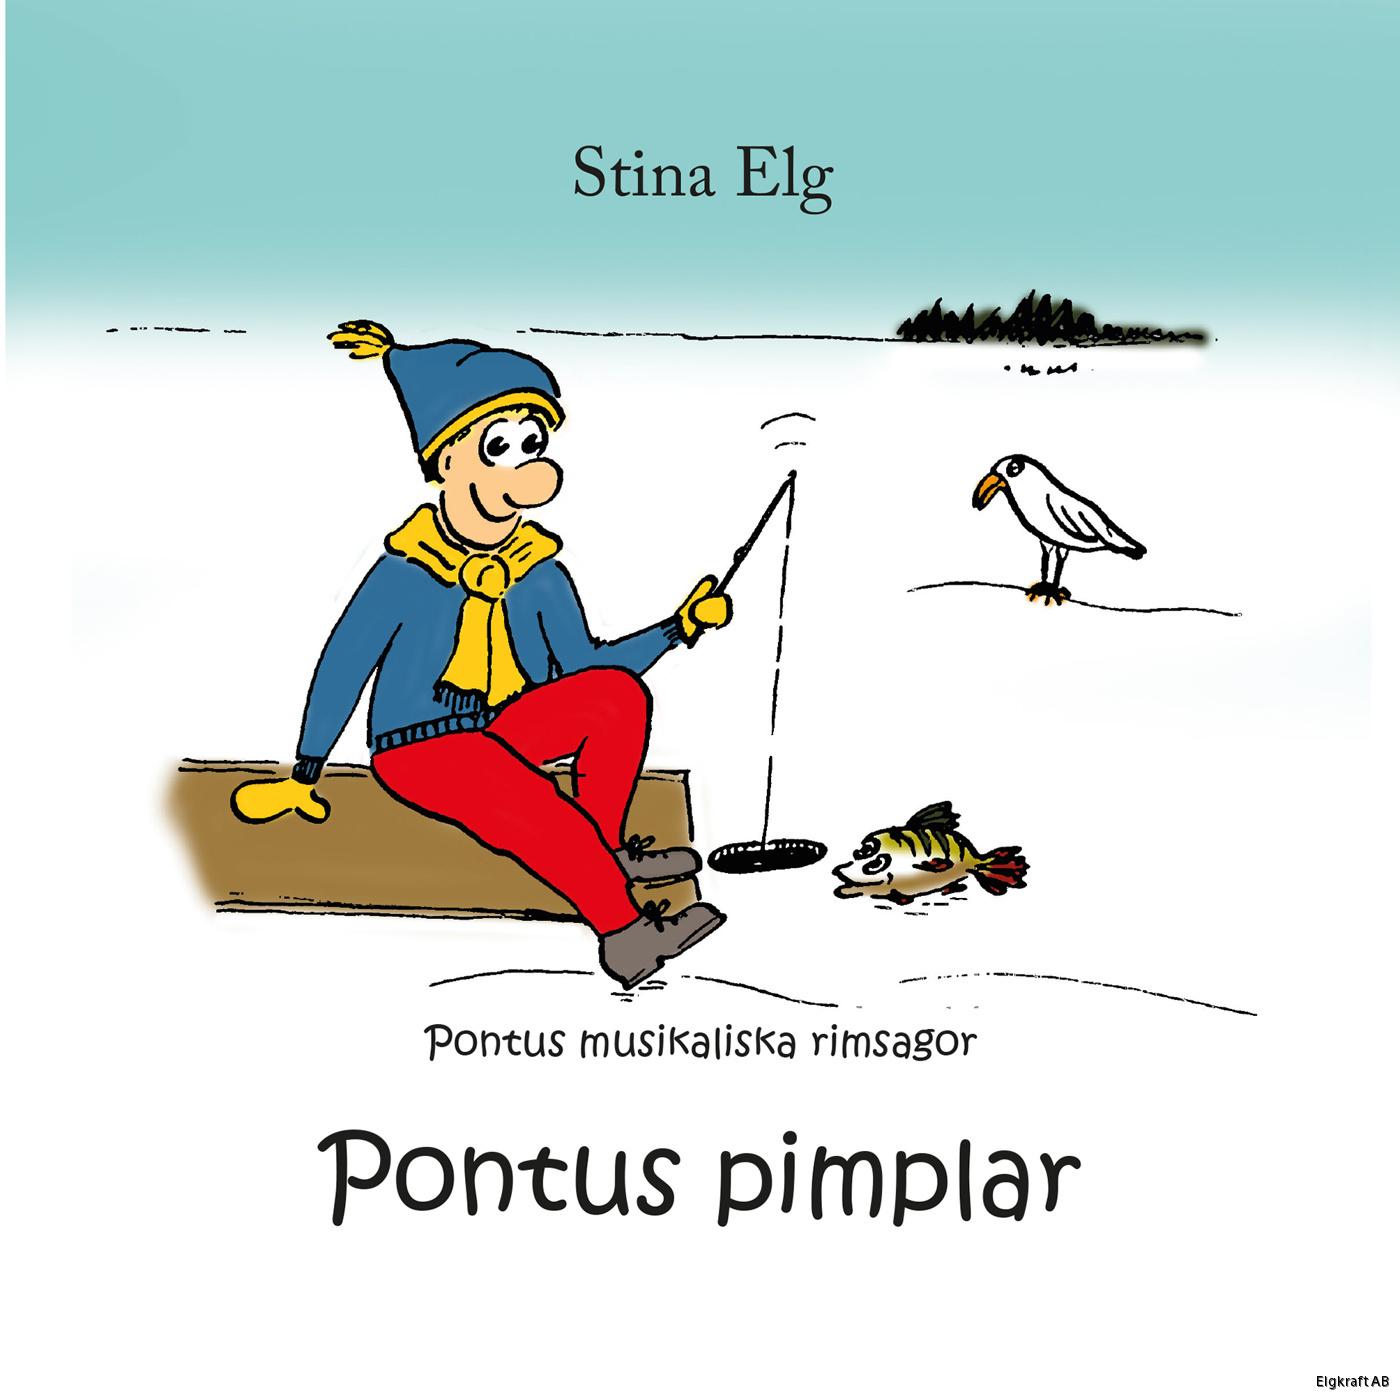 Pontus pimplar